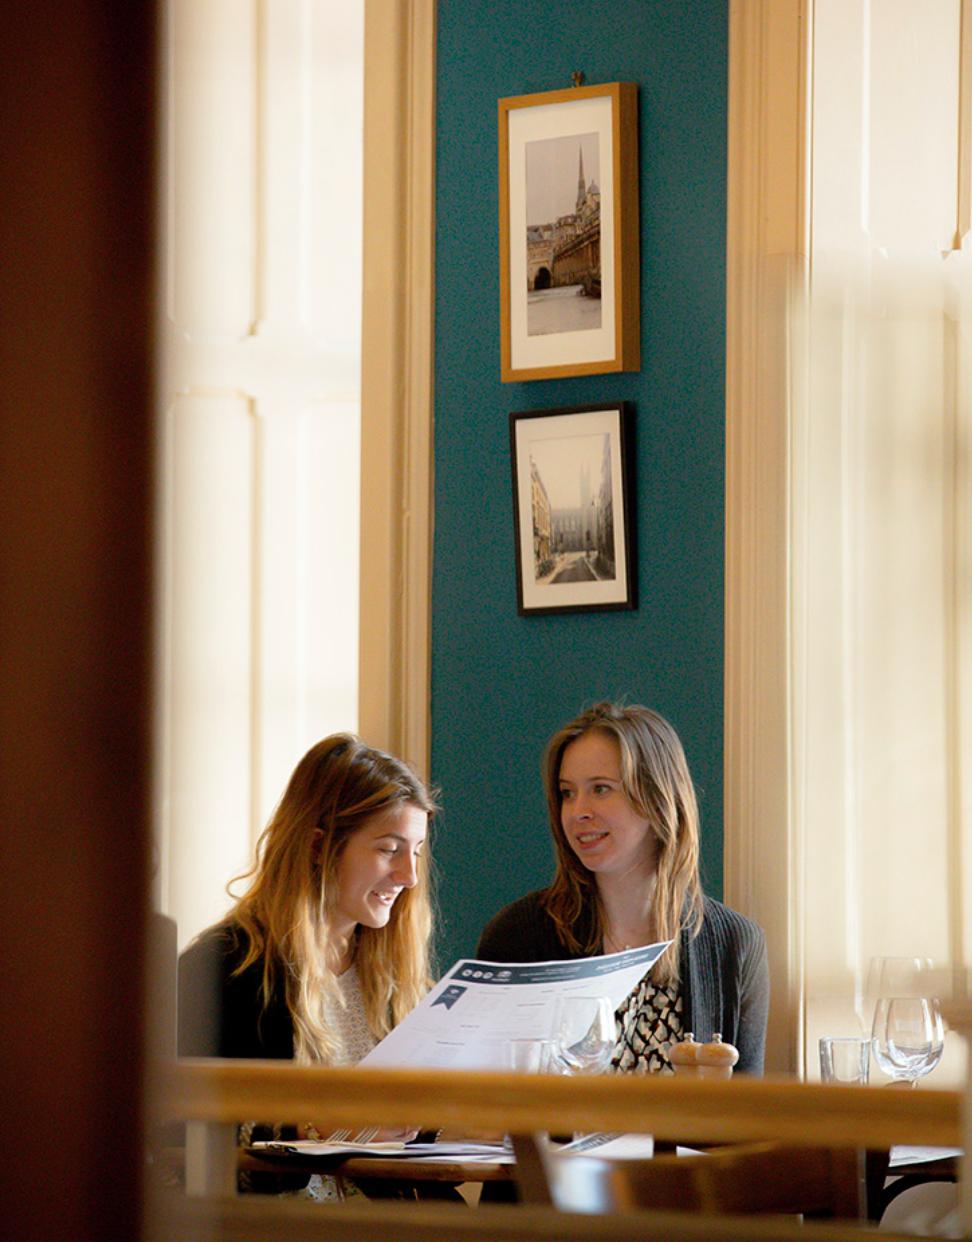 Sunday dining at Green Park Brasserie, Bath